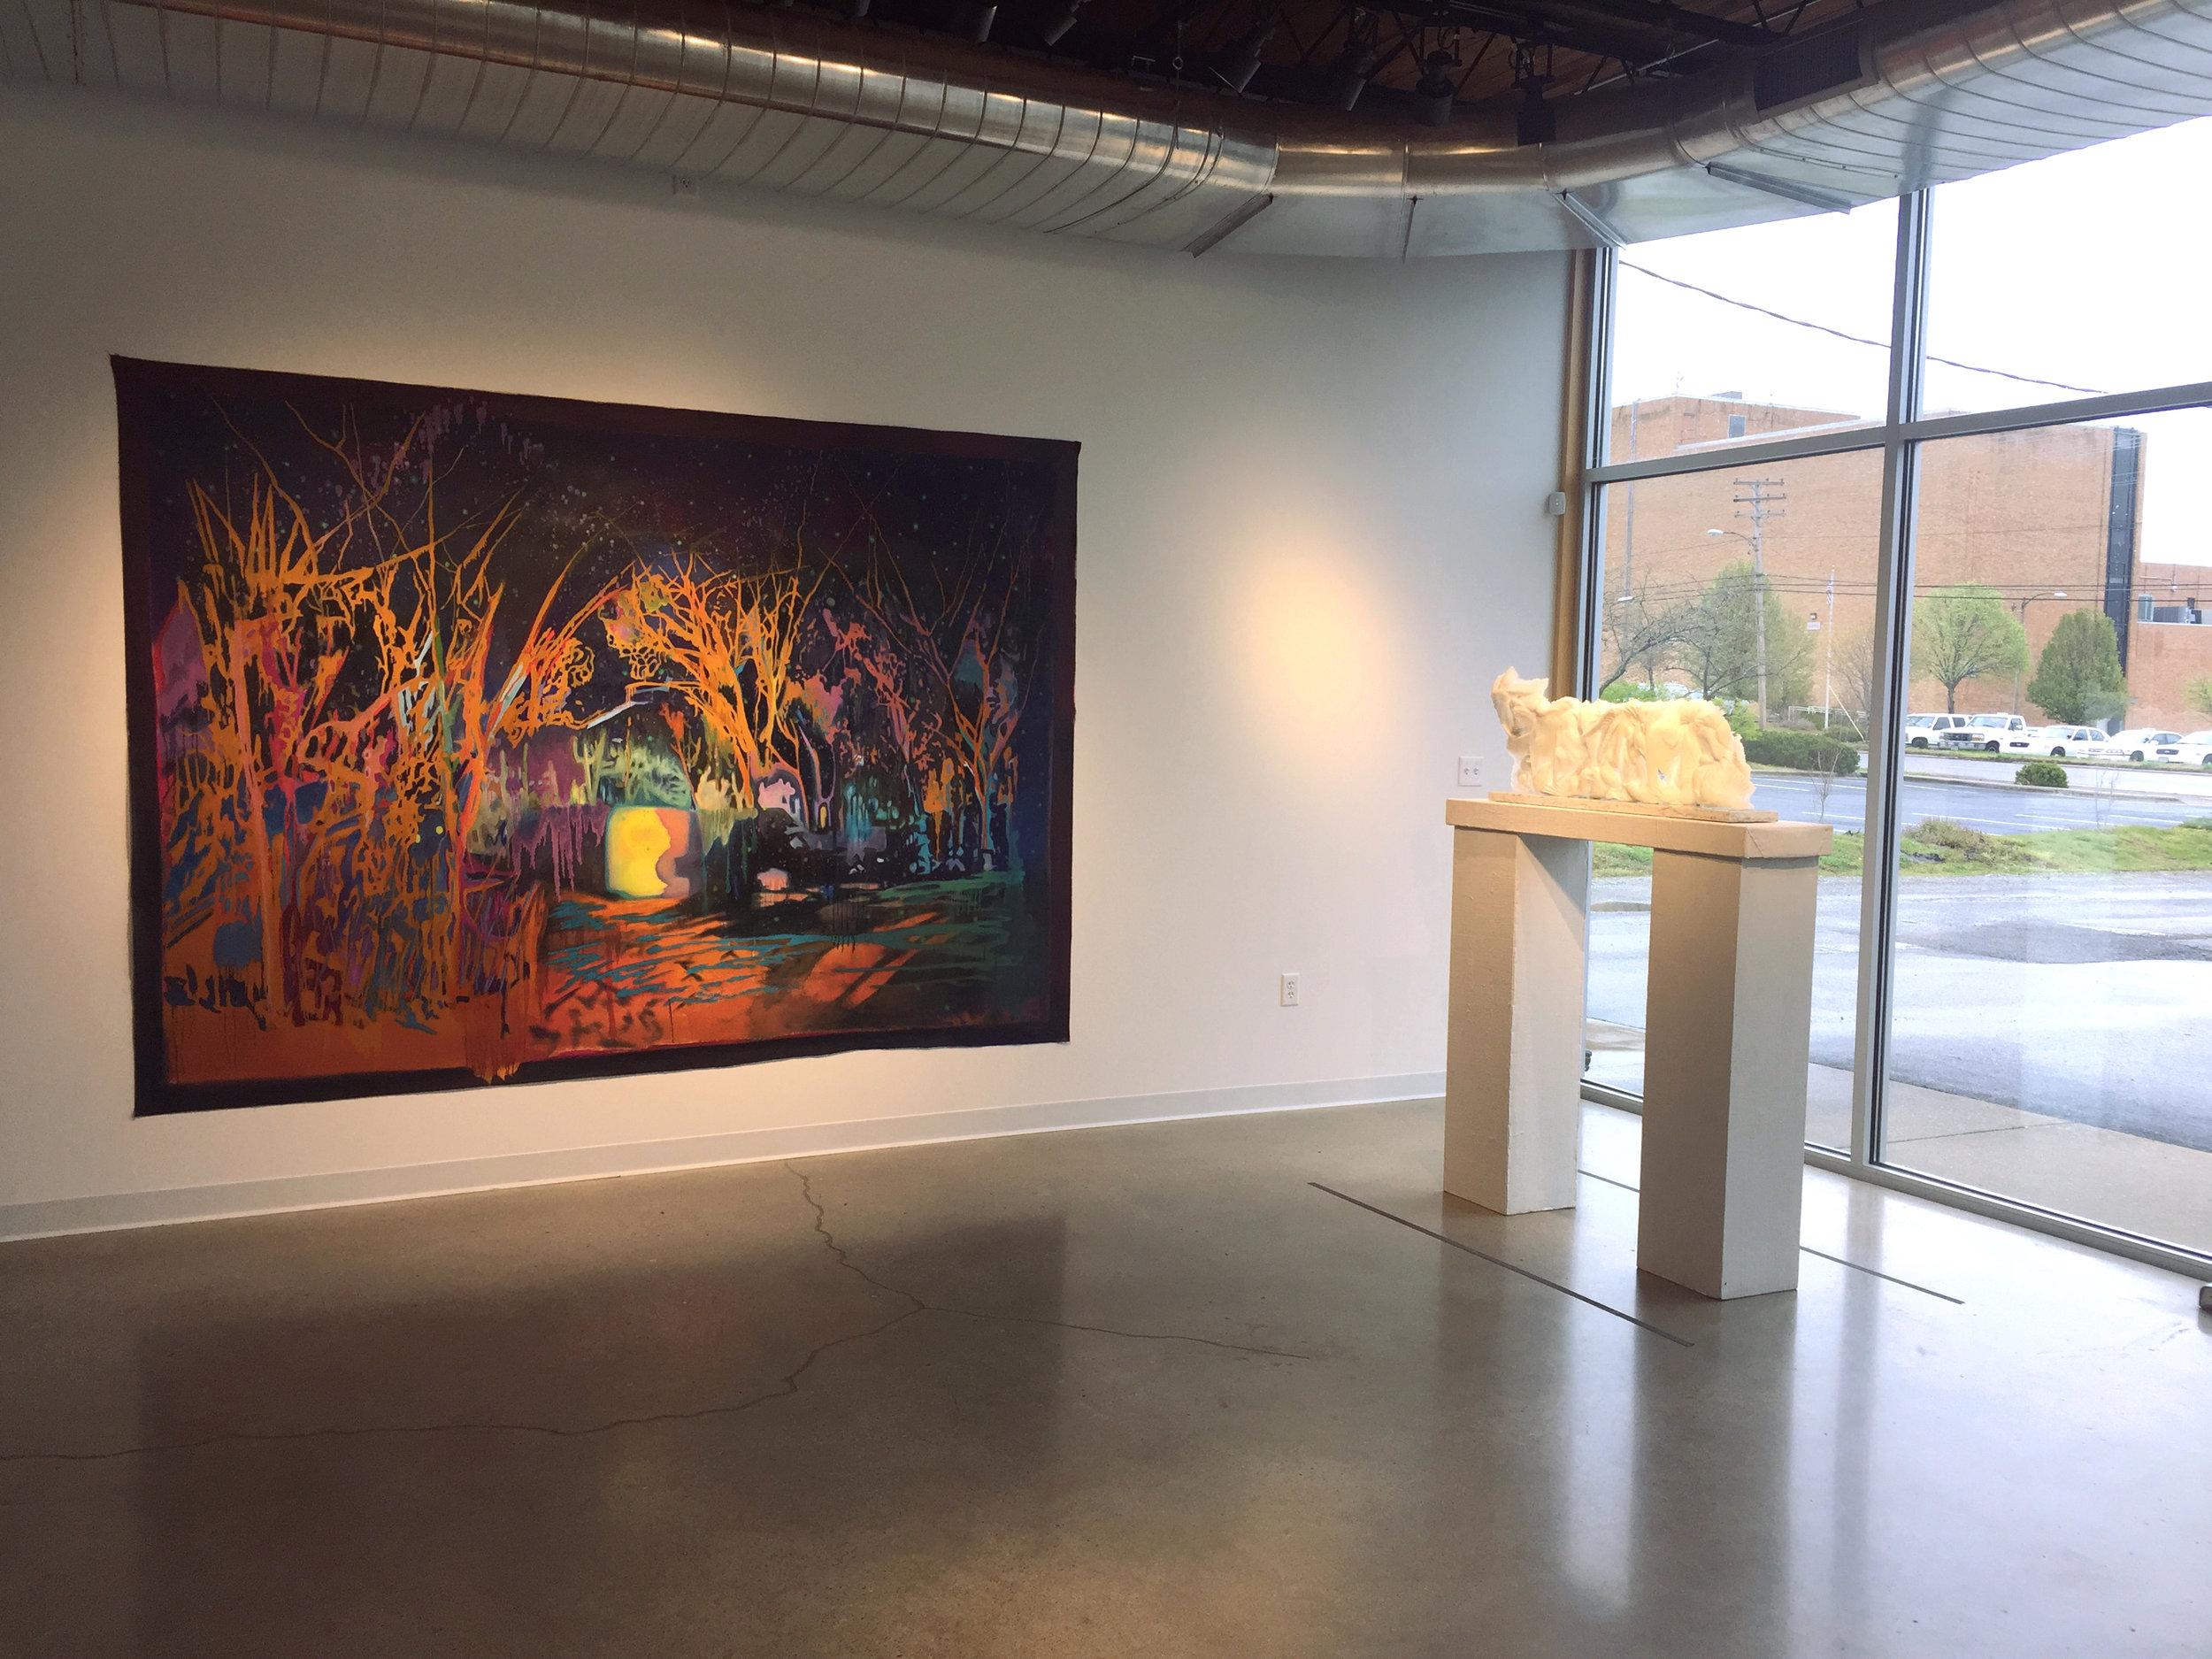 Jon Witzky,  A Relative Place, Unburdened Relaxed,  oil on canvas, 213x305 cm, 2018  Katherine Rutecki,  Cloud Extension,  pate-de-verre, stone, 101x18x43 cm, 2018